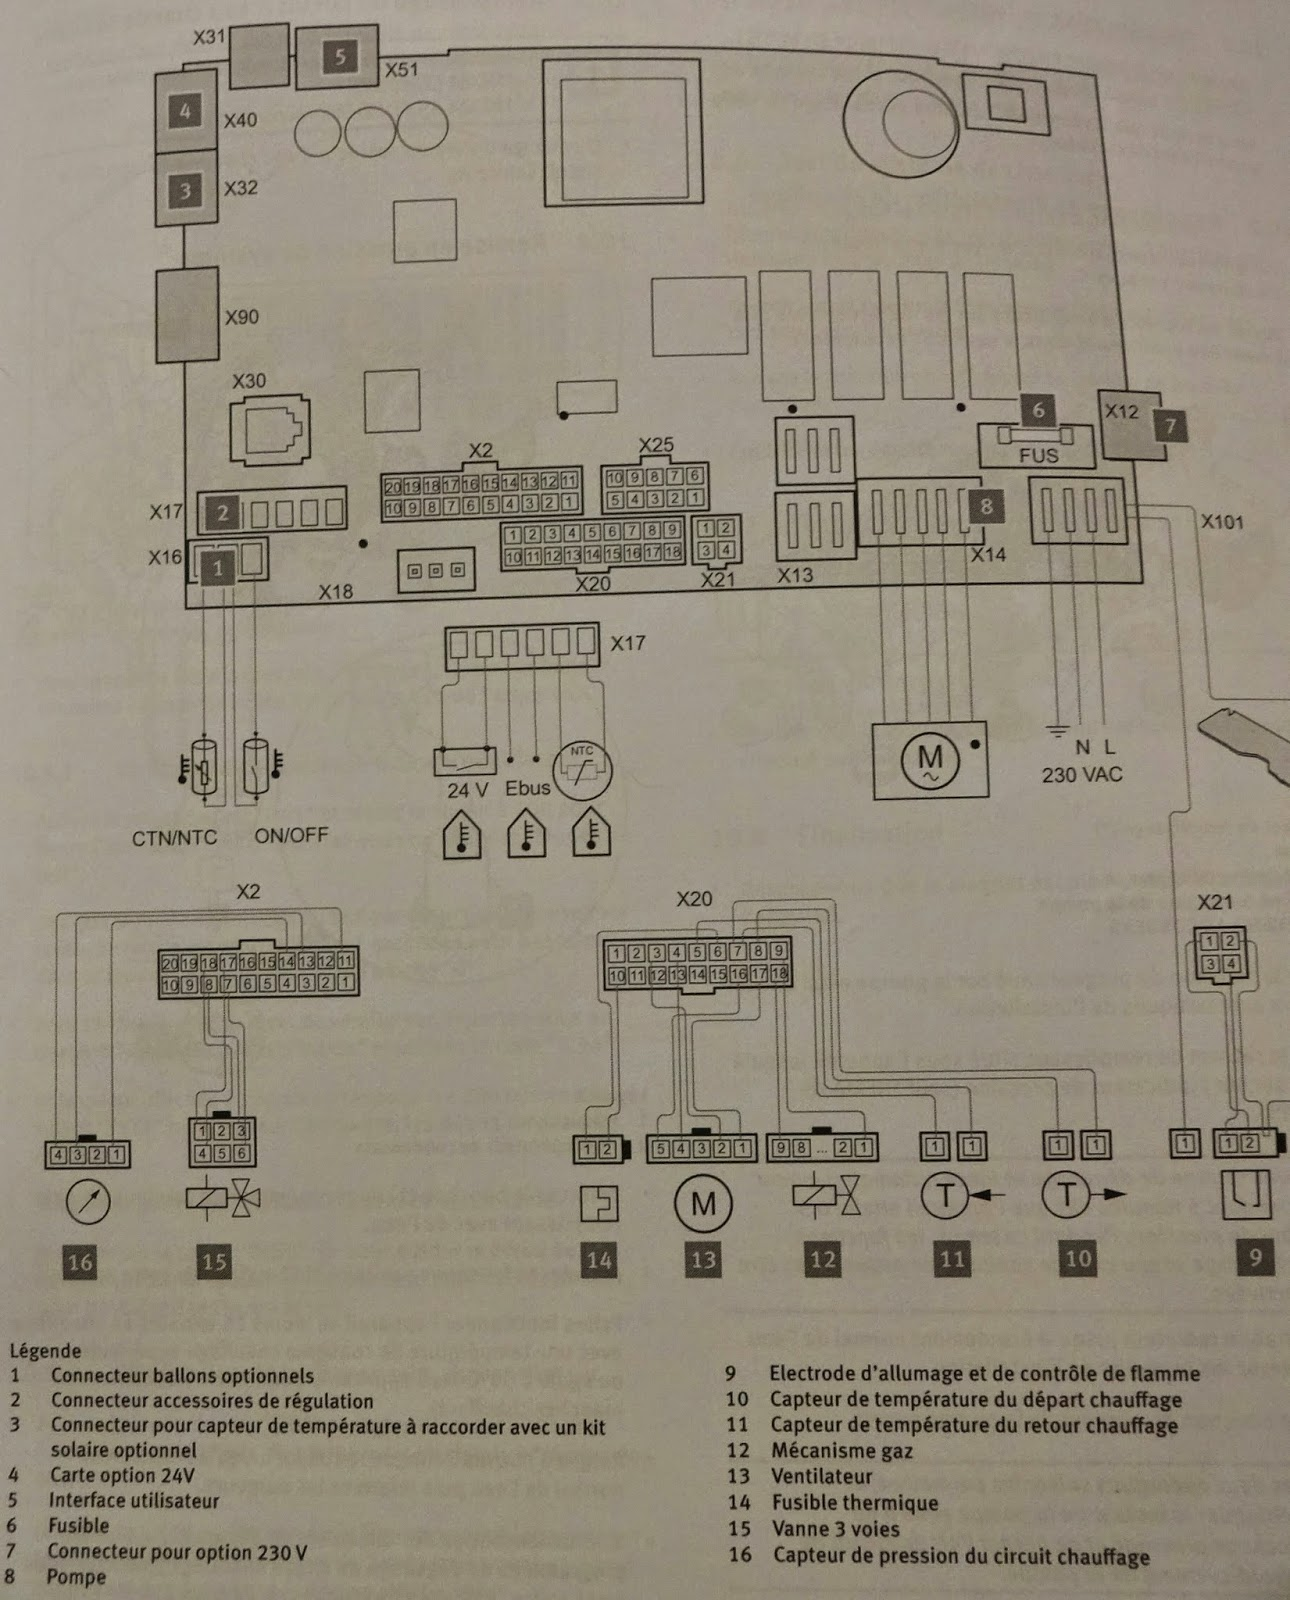 mes droldids installer un thermostat connect nest. Black Bedroom Furniture Sets. Home Design Ideas